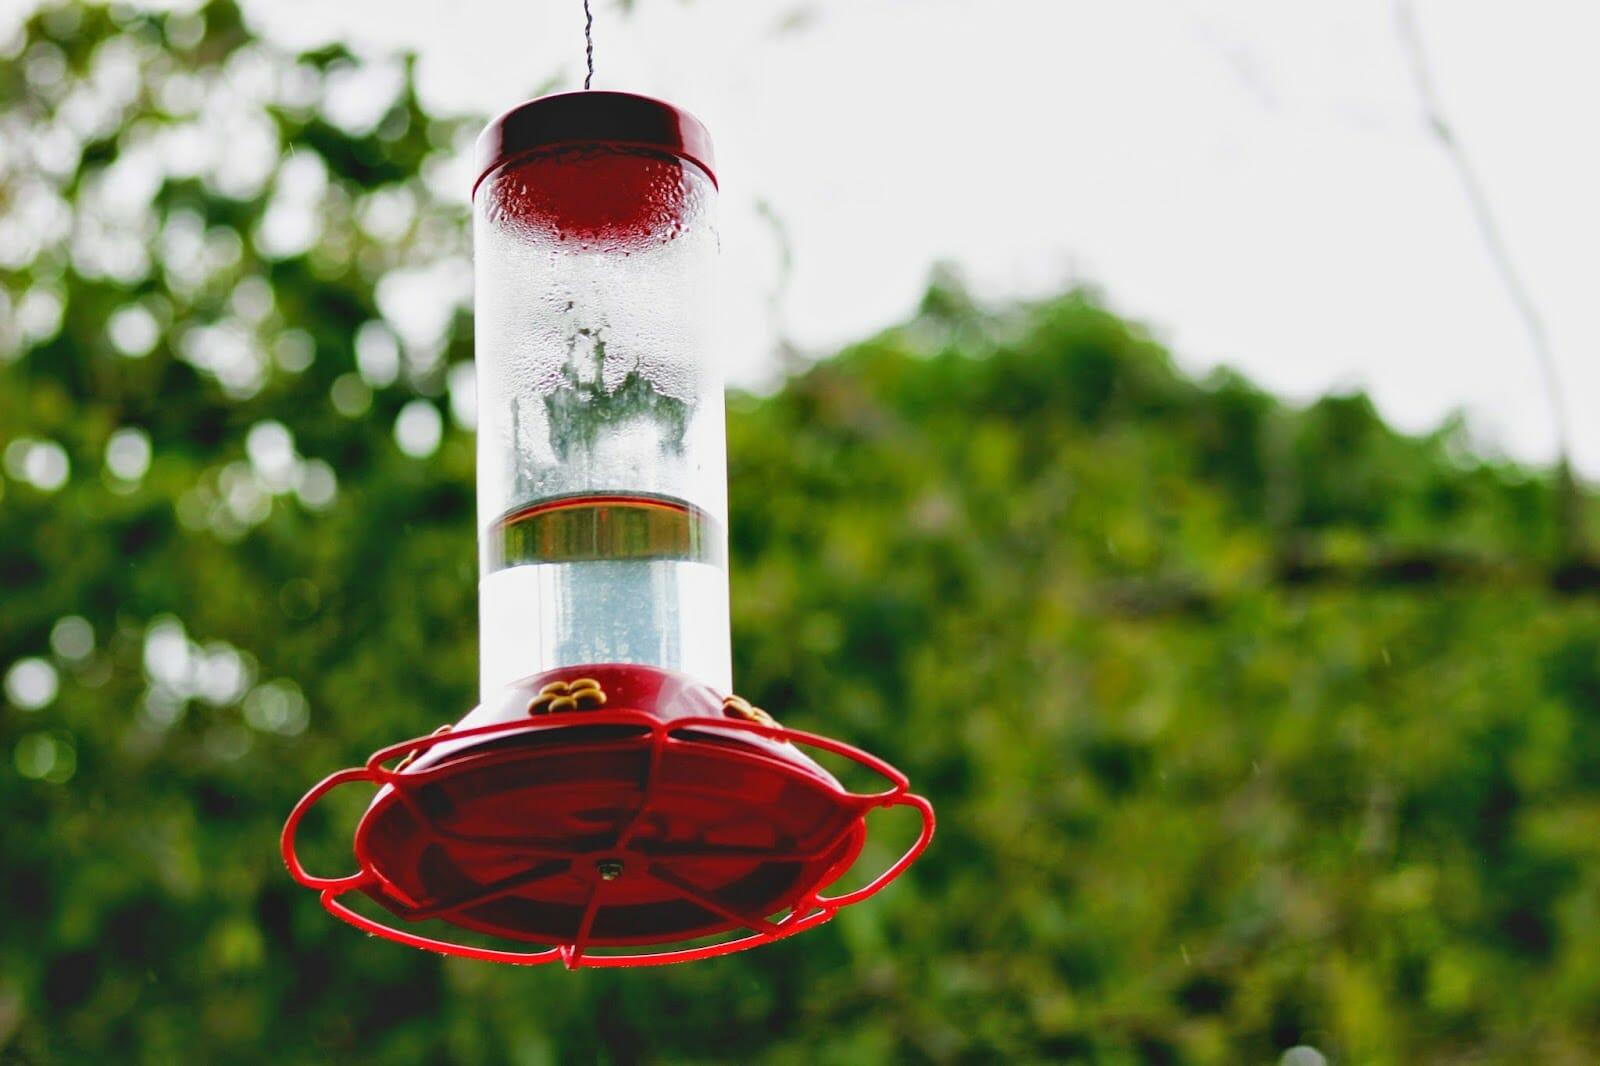 why does my hummingbird feeder get air locked